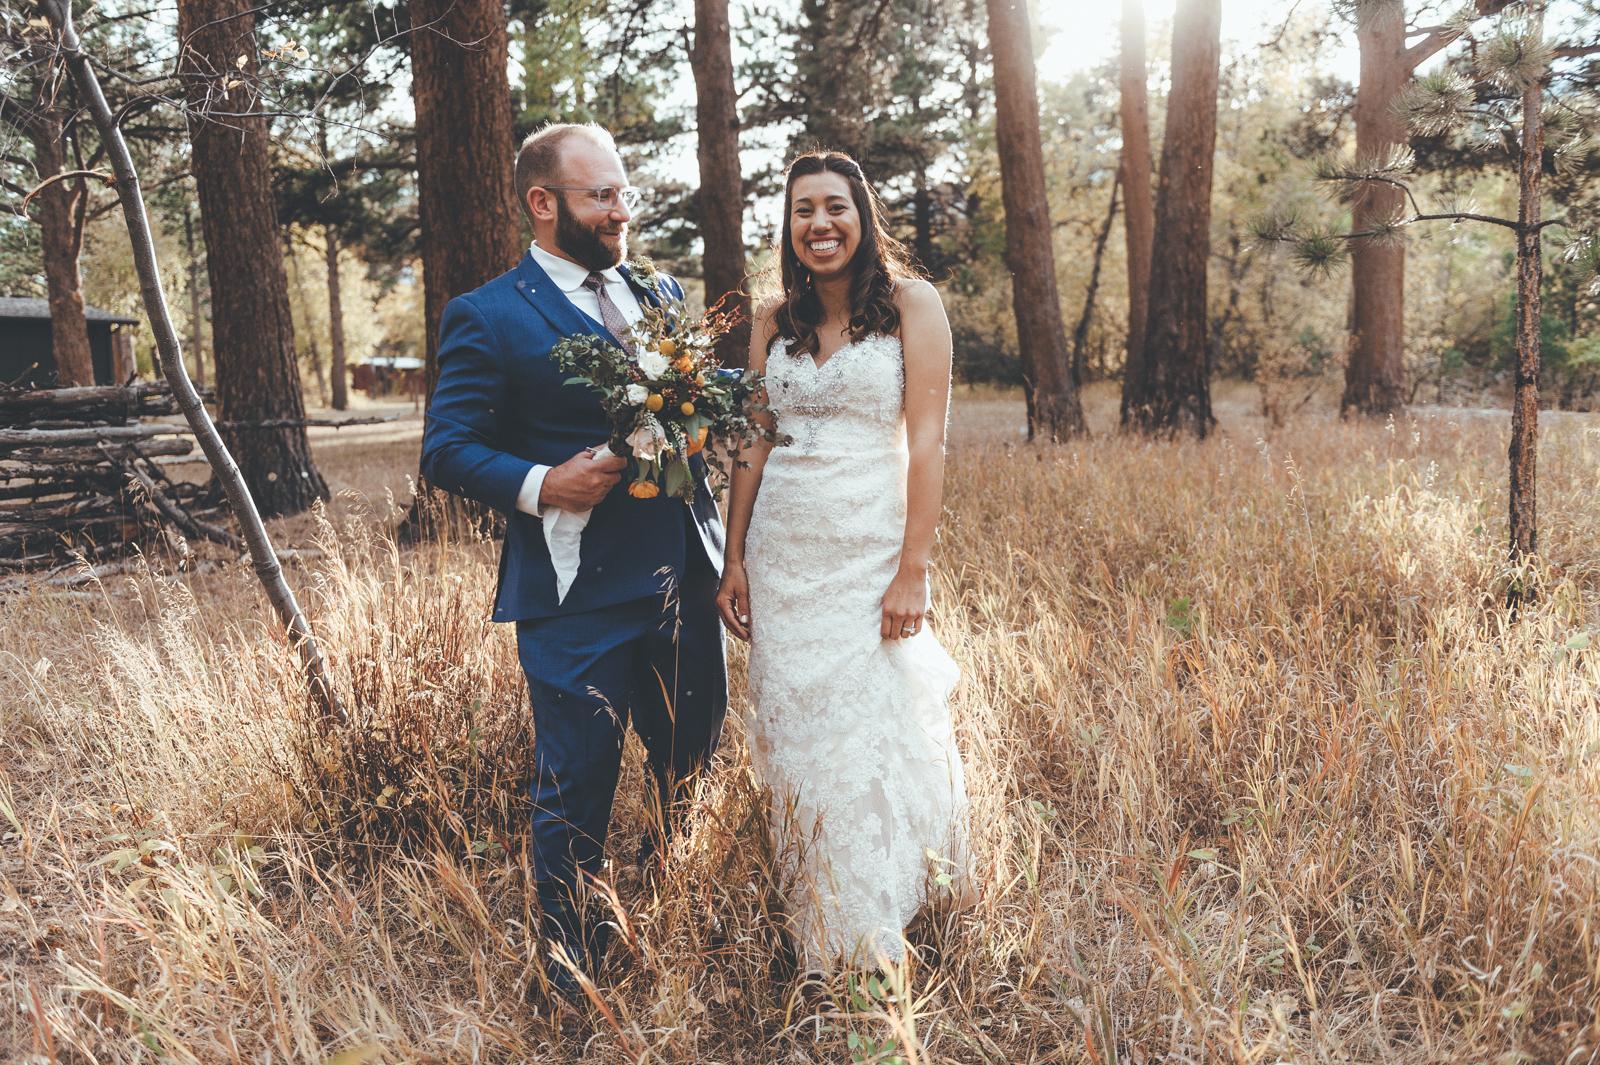 ChadFahnestockPhotography-estes-park-wedding-photography-040.jpg